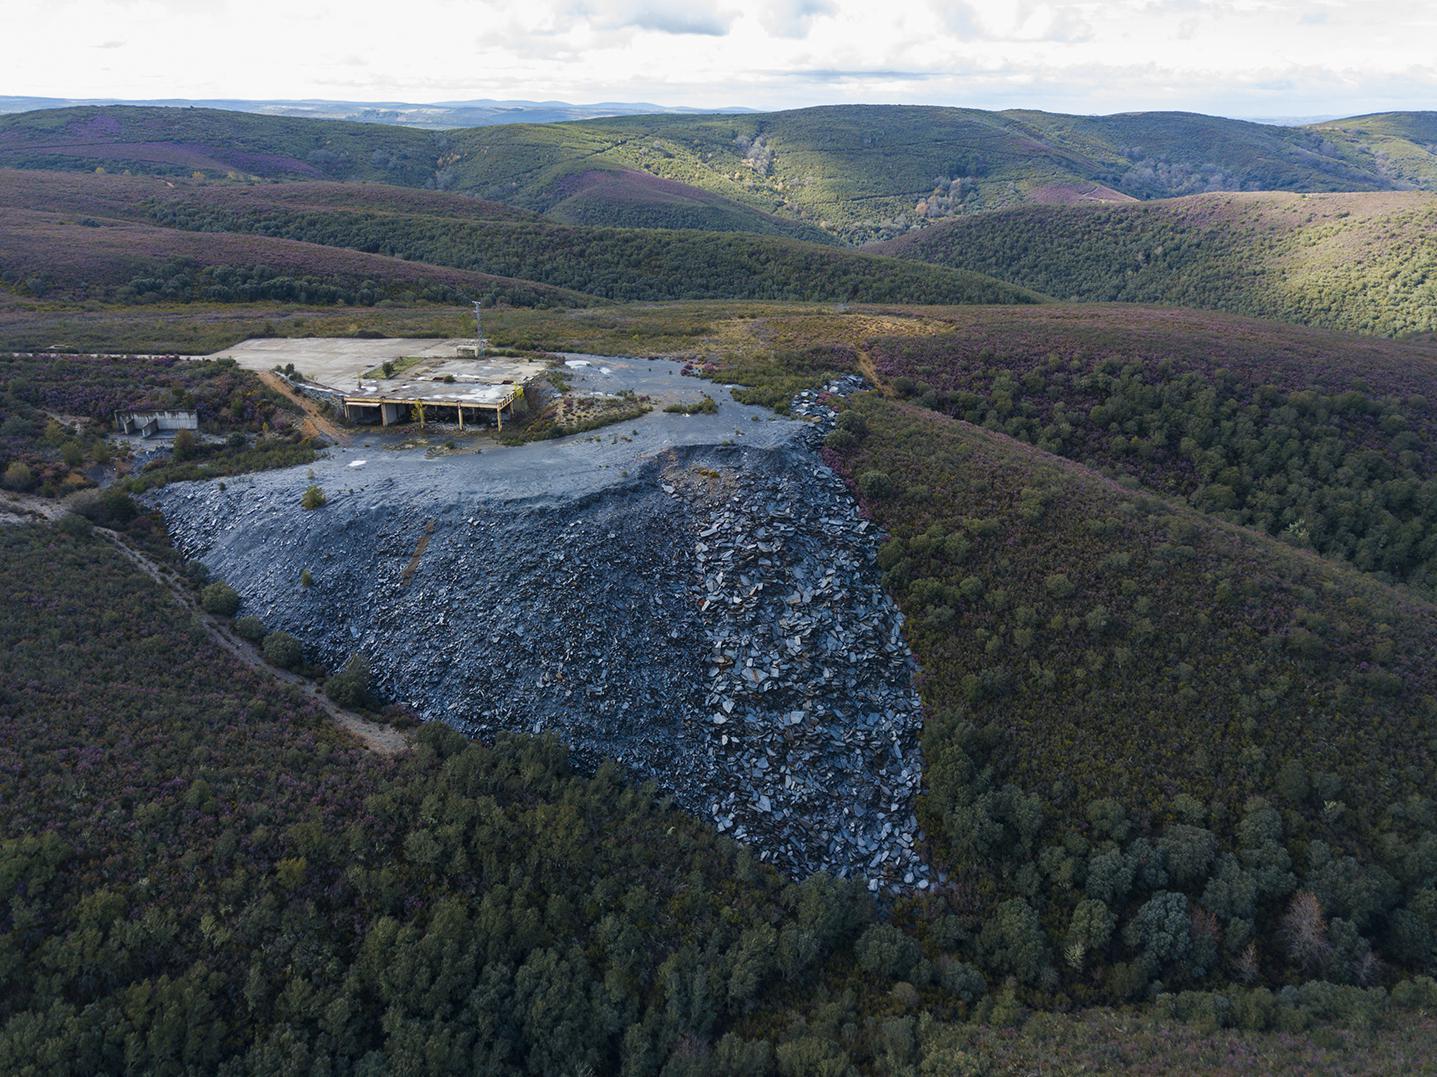 Rechazo ecologista a la mina en plena Sierra de la Culebra